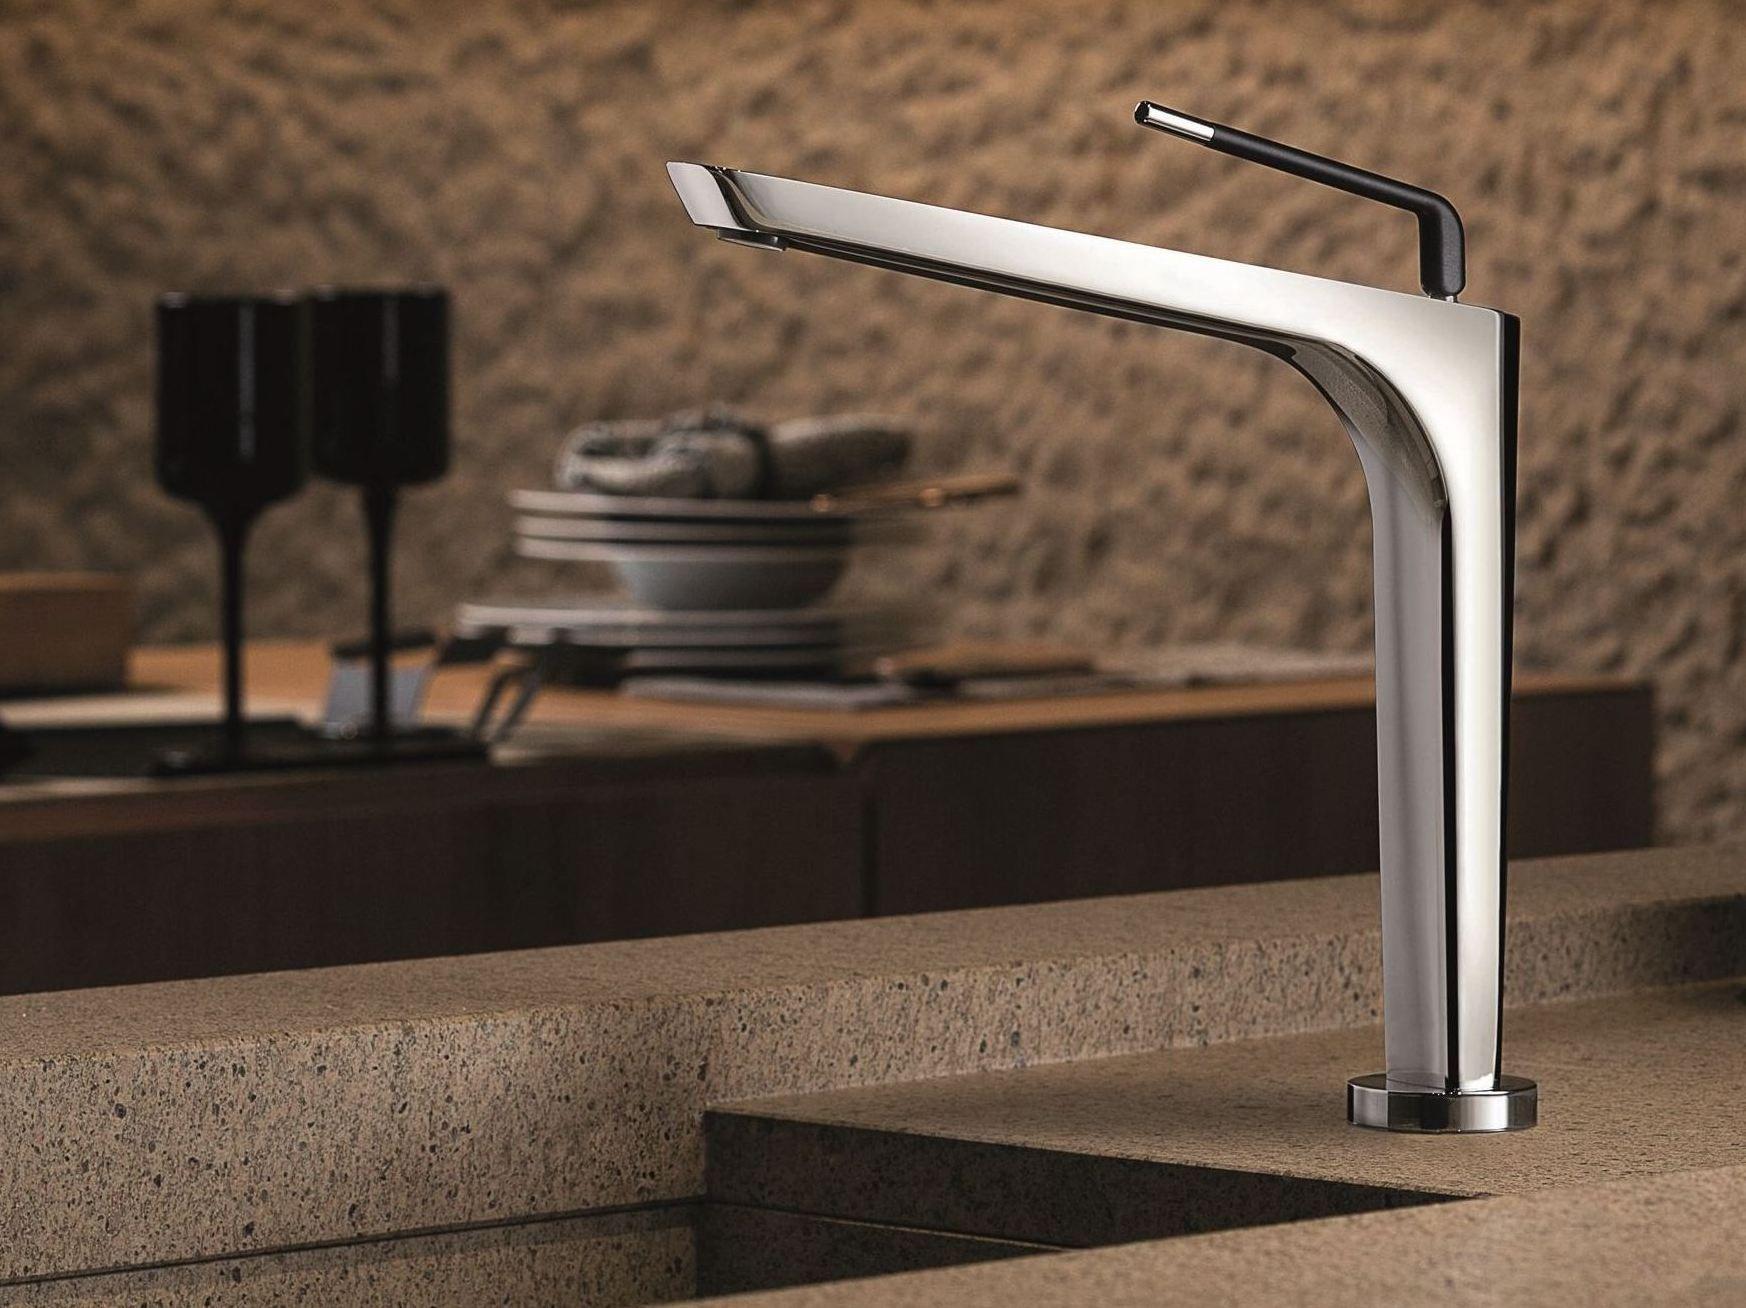 newform | rubinetteria bagno e cucina | archiproducts - Ceramica Bagno Fluida Di Newform